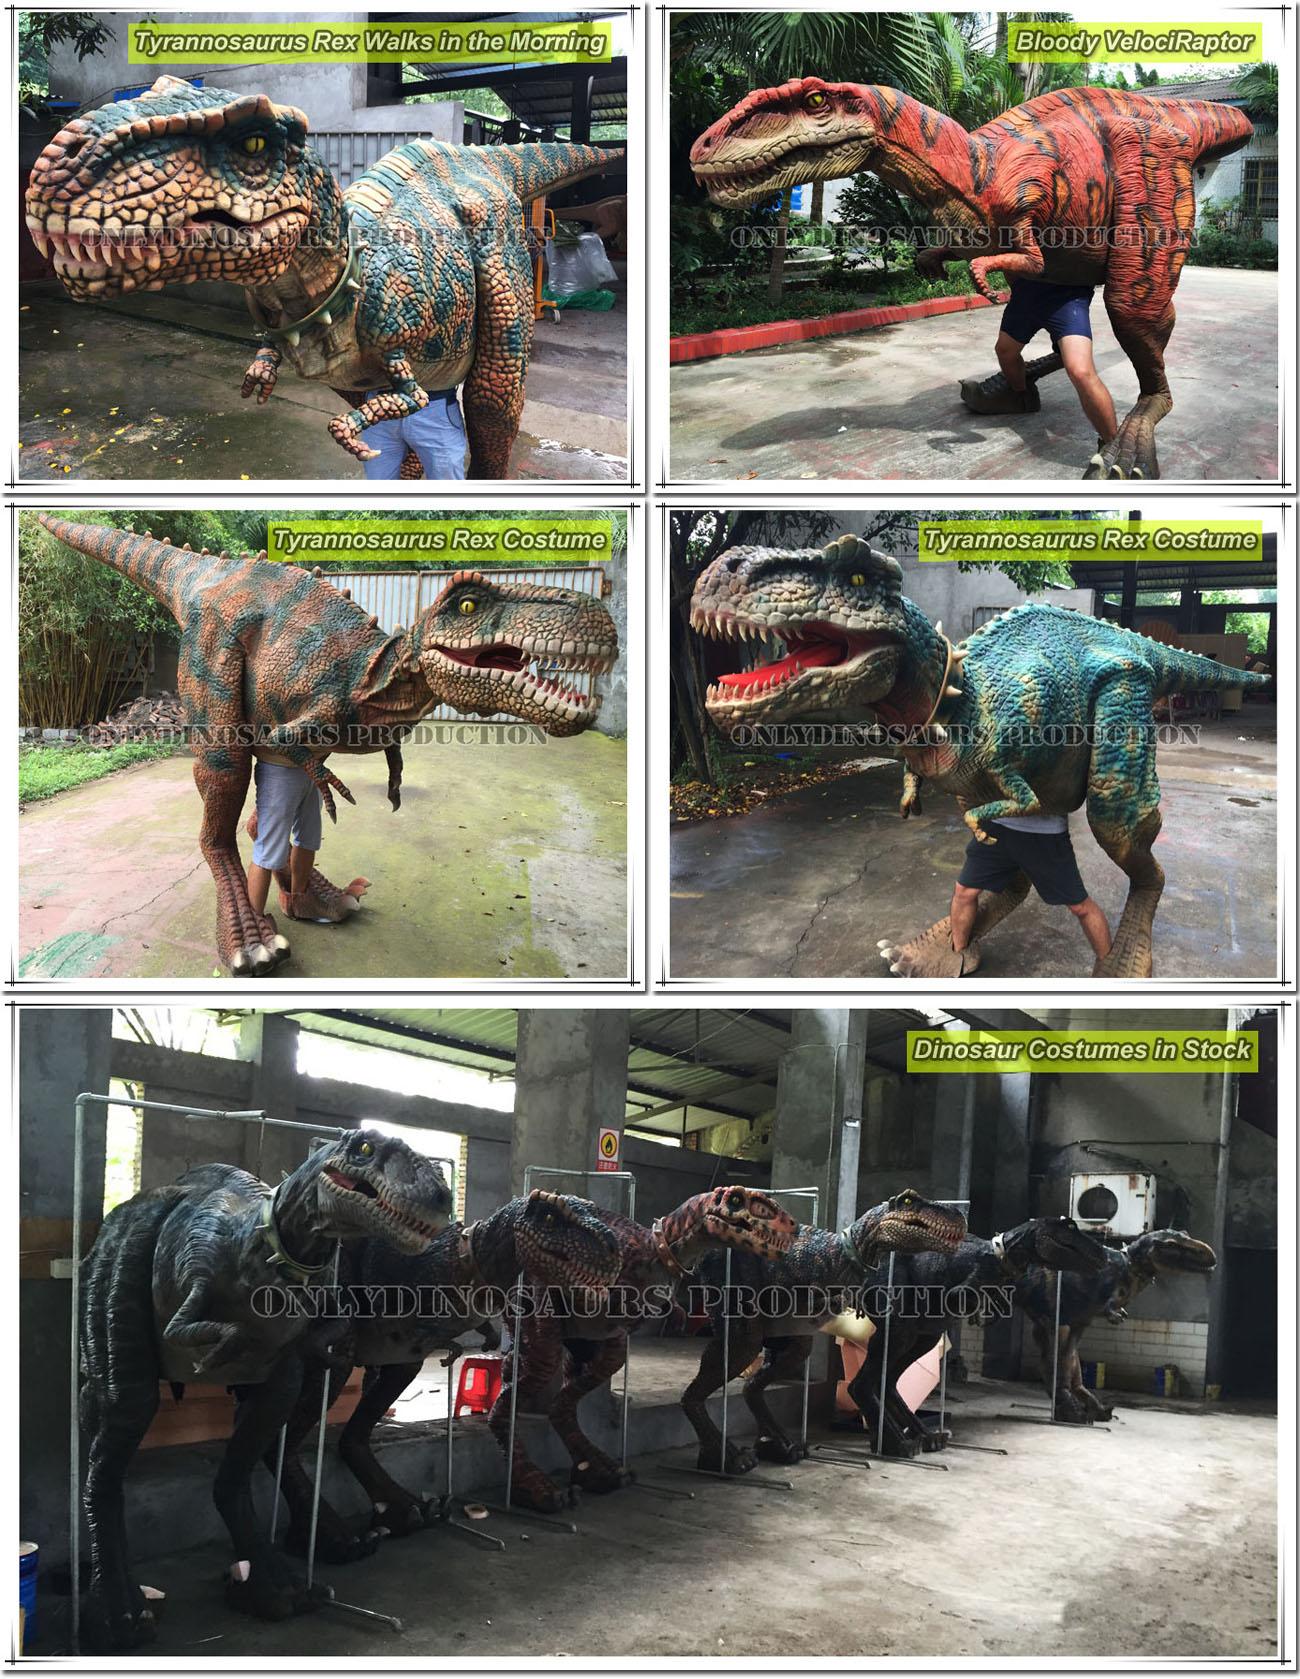 Dinosaur Costumes in Stock